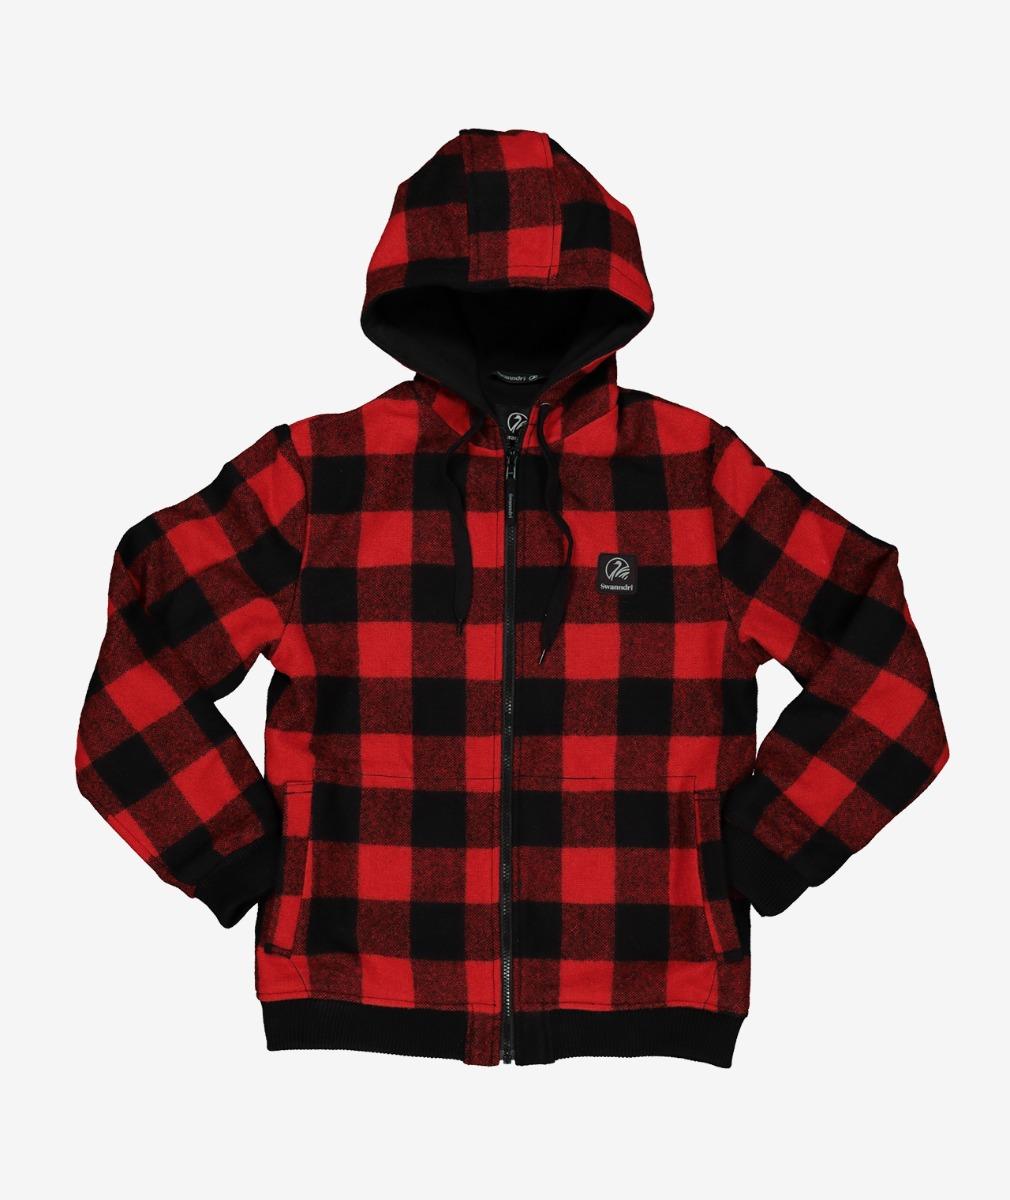 Swanndri Kid's Crooked River Wool Hoody in Red/Black Check